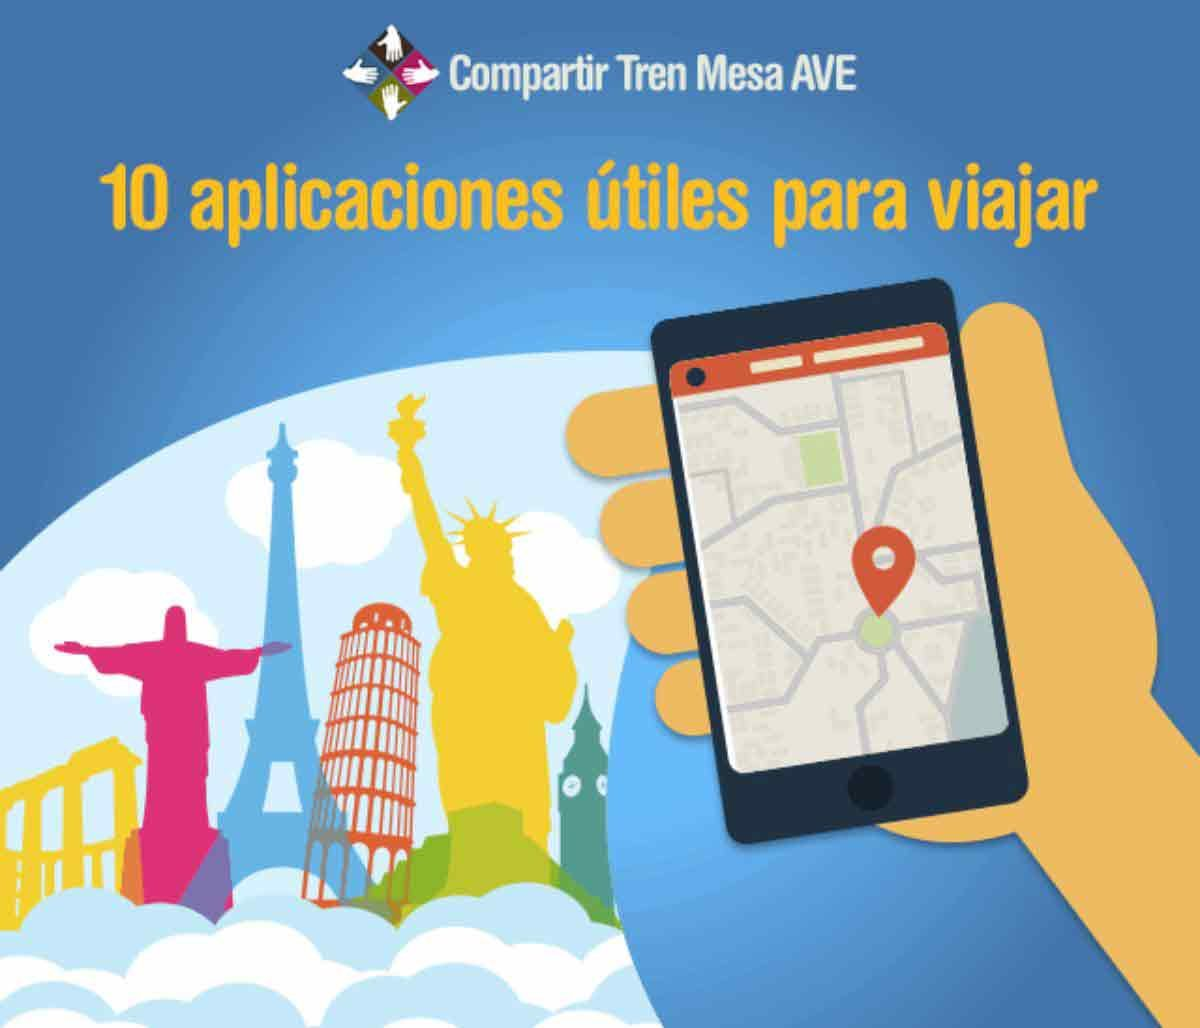 10 aplicaciones útiles para viajar